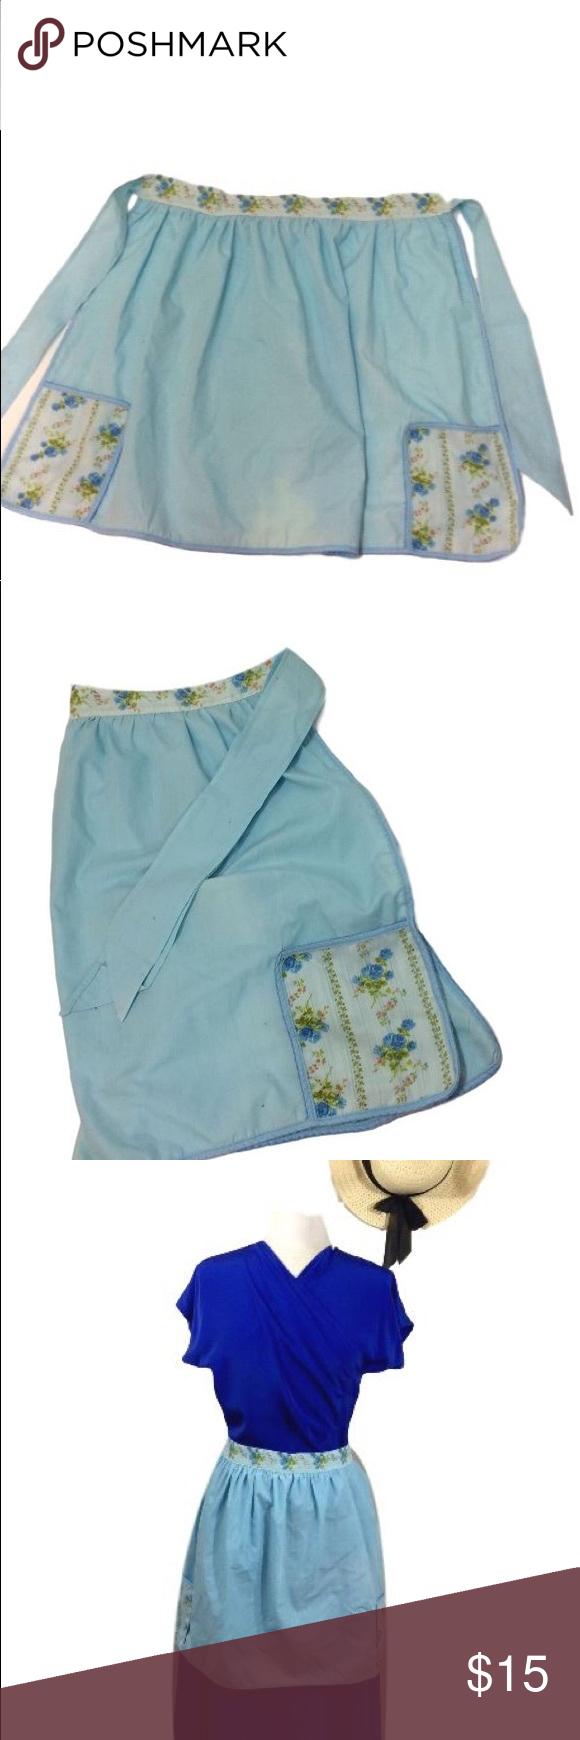 Vintage Blue Floral Print Half Apron